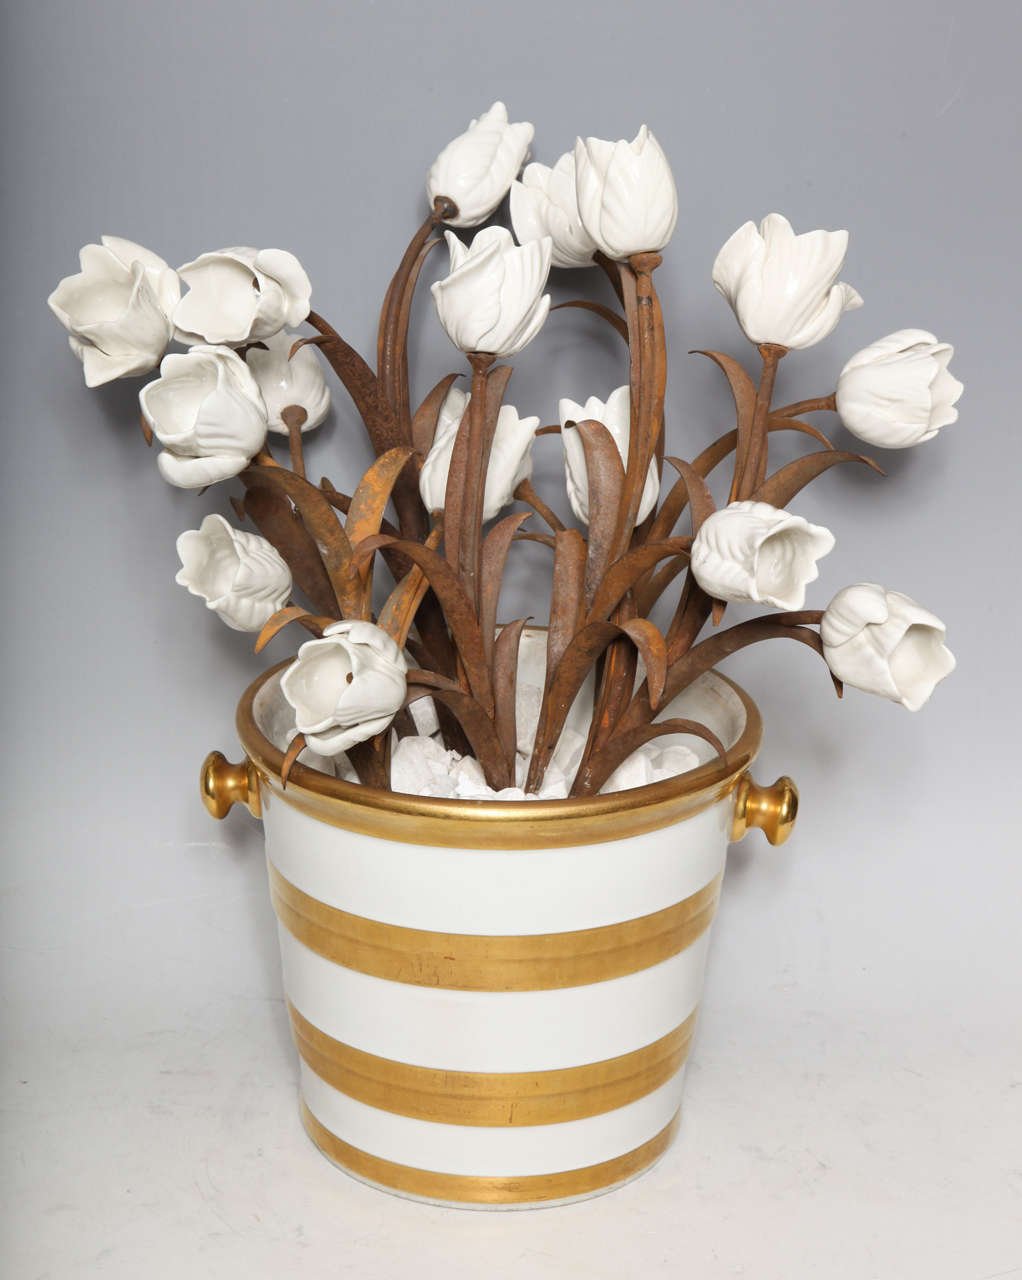 Unusual Pair of Antique French Louis XVI Style Porcelain Flower Baskets, Jansen For Sale 2